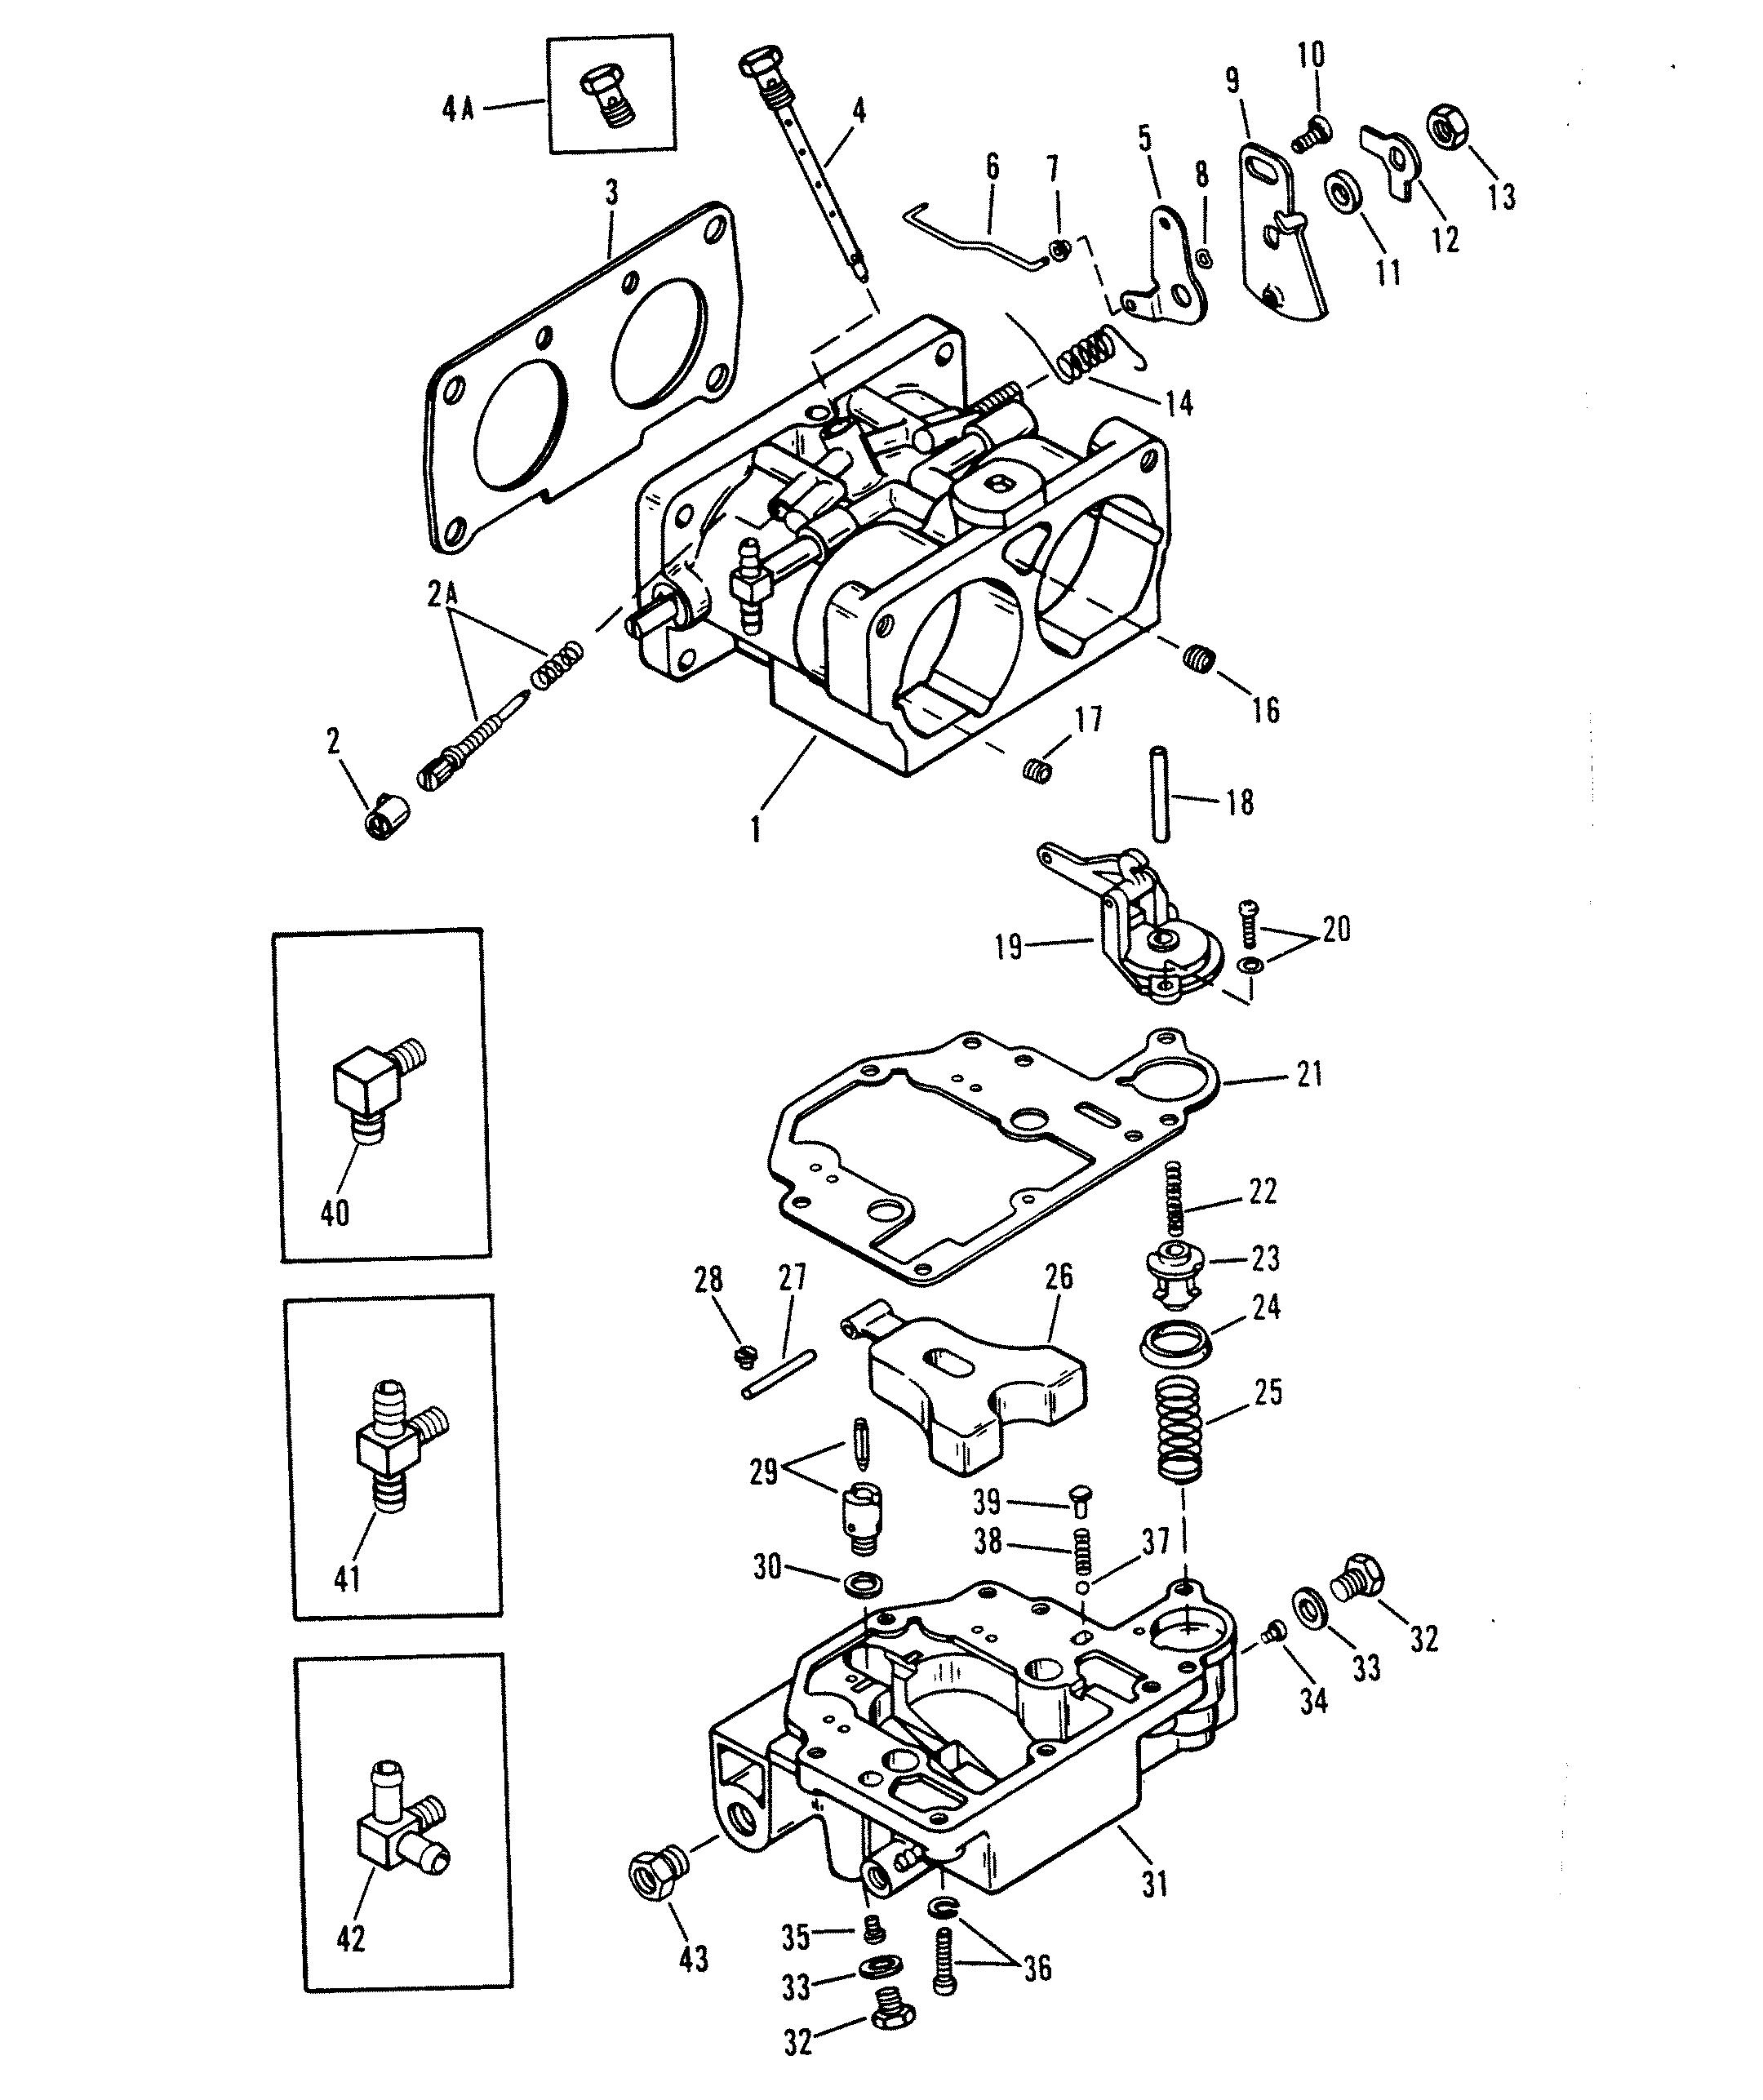 Race Outboard Merc Mar Xr2 Magnum 0c276430 Thru Wiring Mercury Diagram Harness 150 Carburetor Assembly